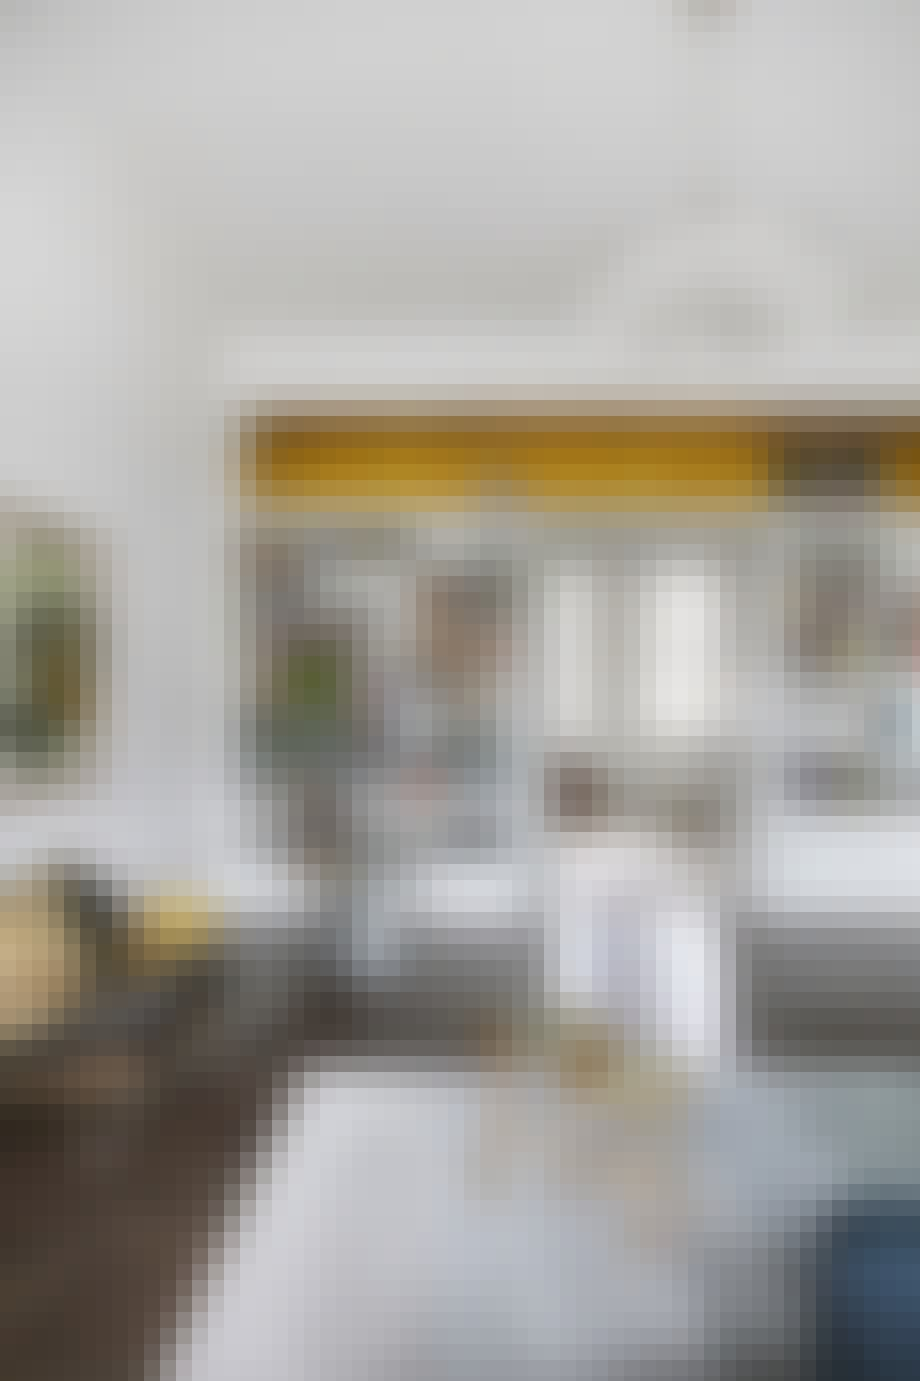 boligreportage boligindreting lysekrone stue reol